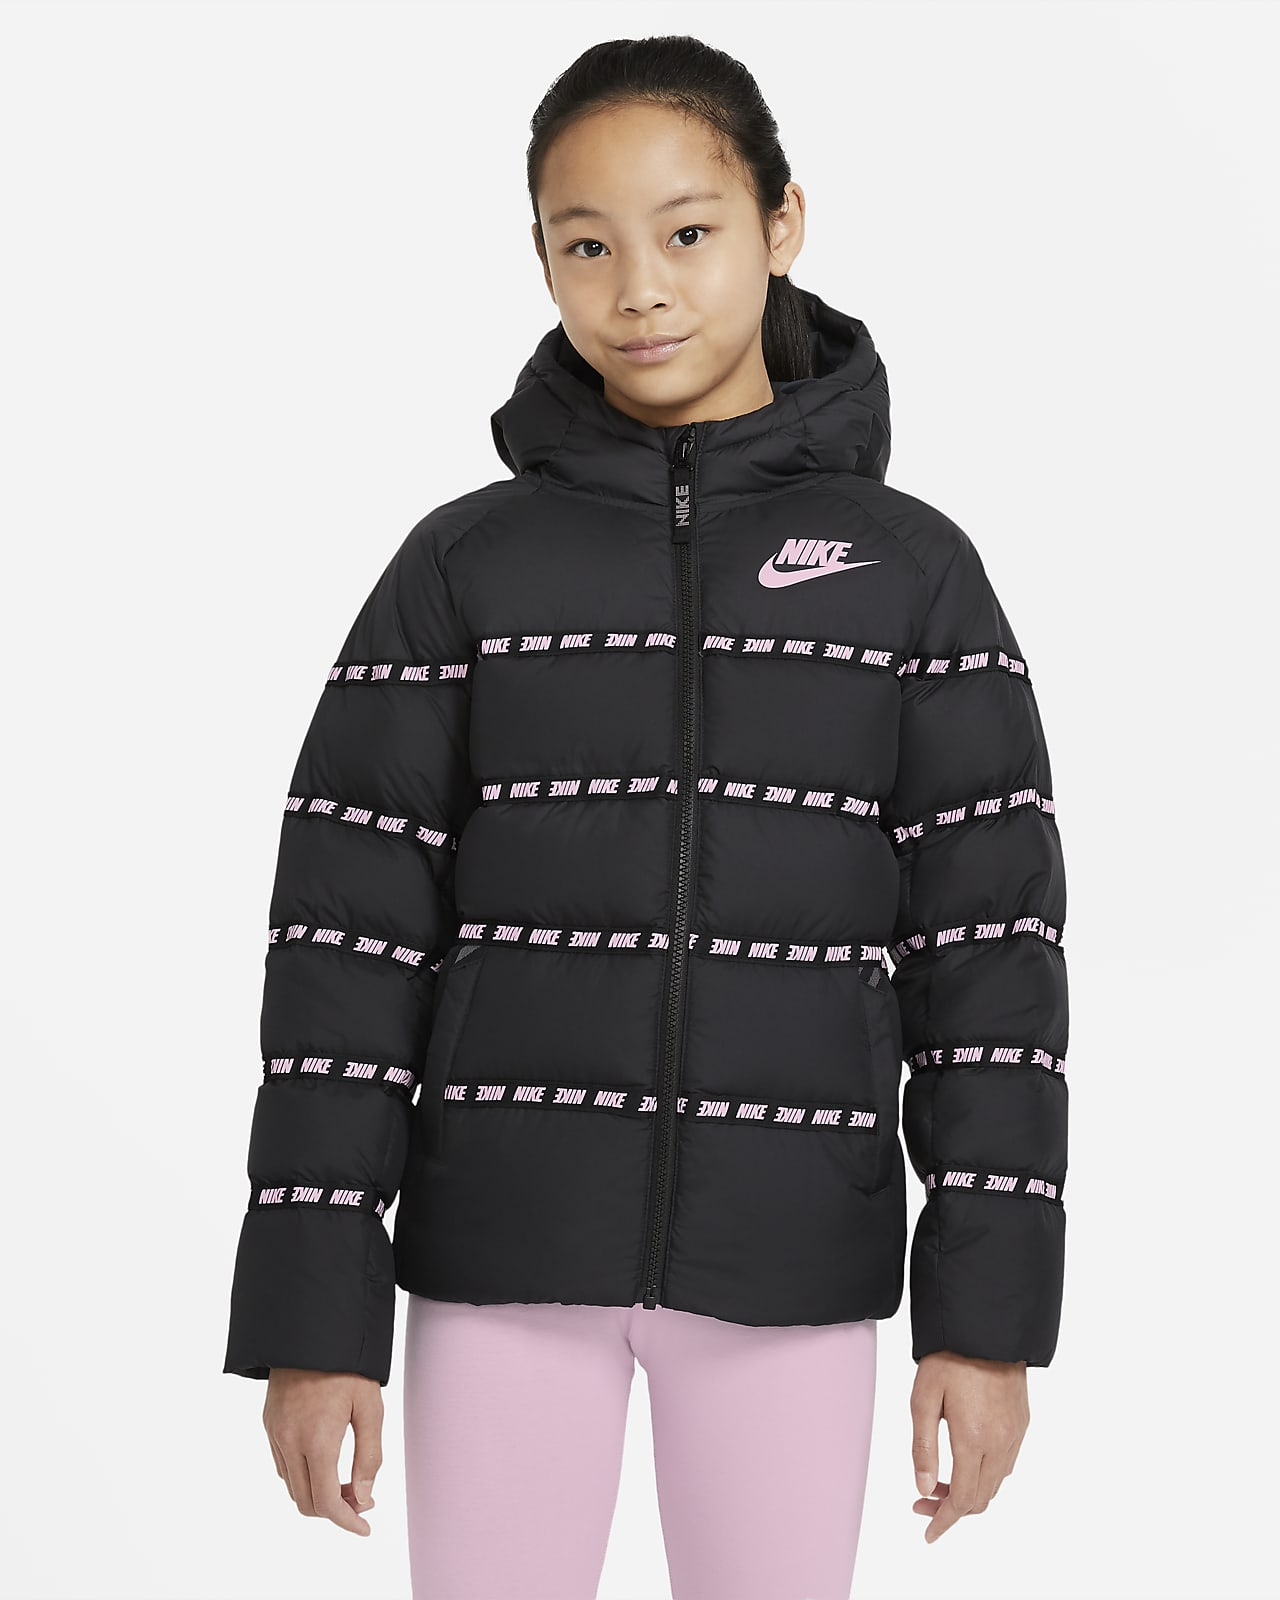 Chamarra con relleno de plumas para niños talla grande Nike Sportswear